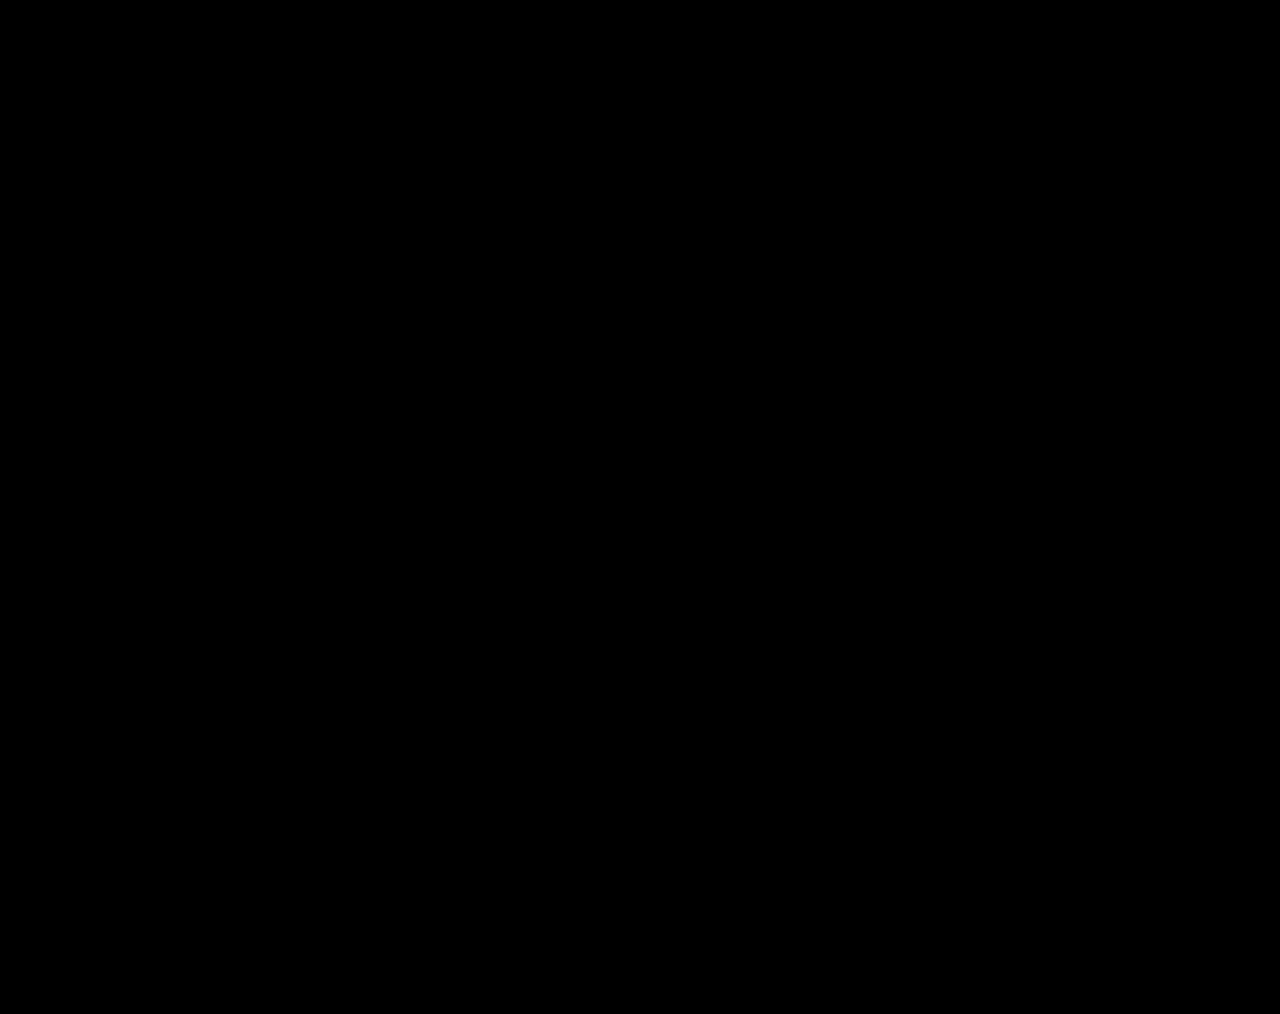 1280x1014 Sasuke Boruto The Movie Lineart By Rosolinio